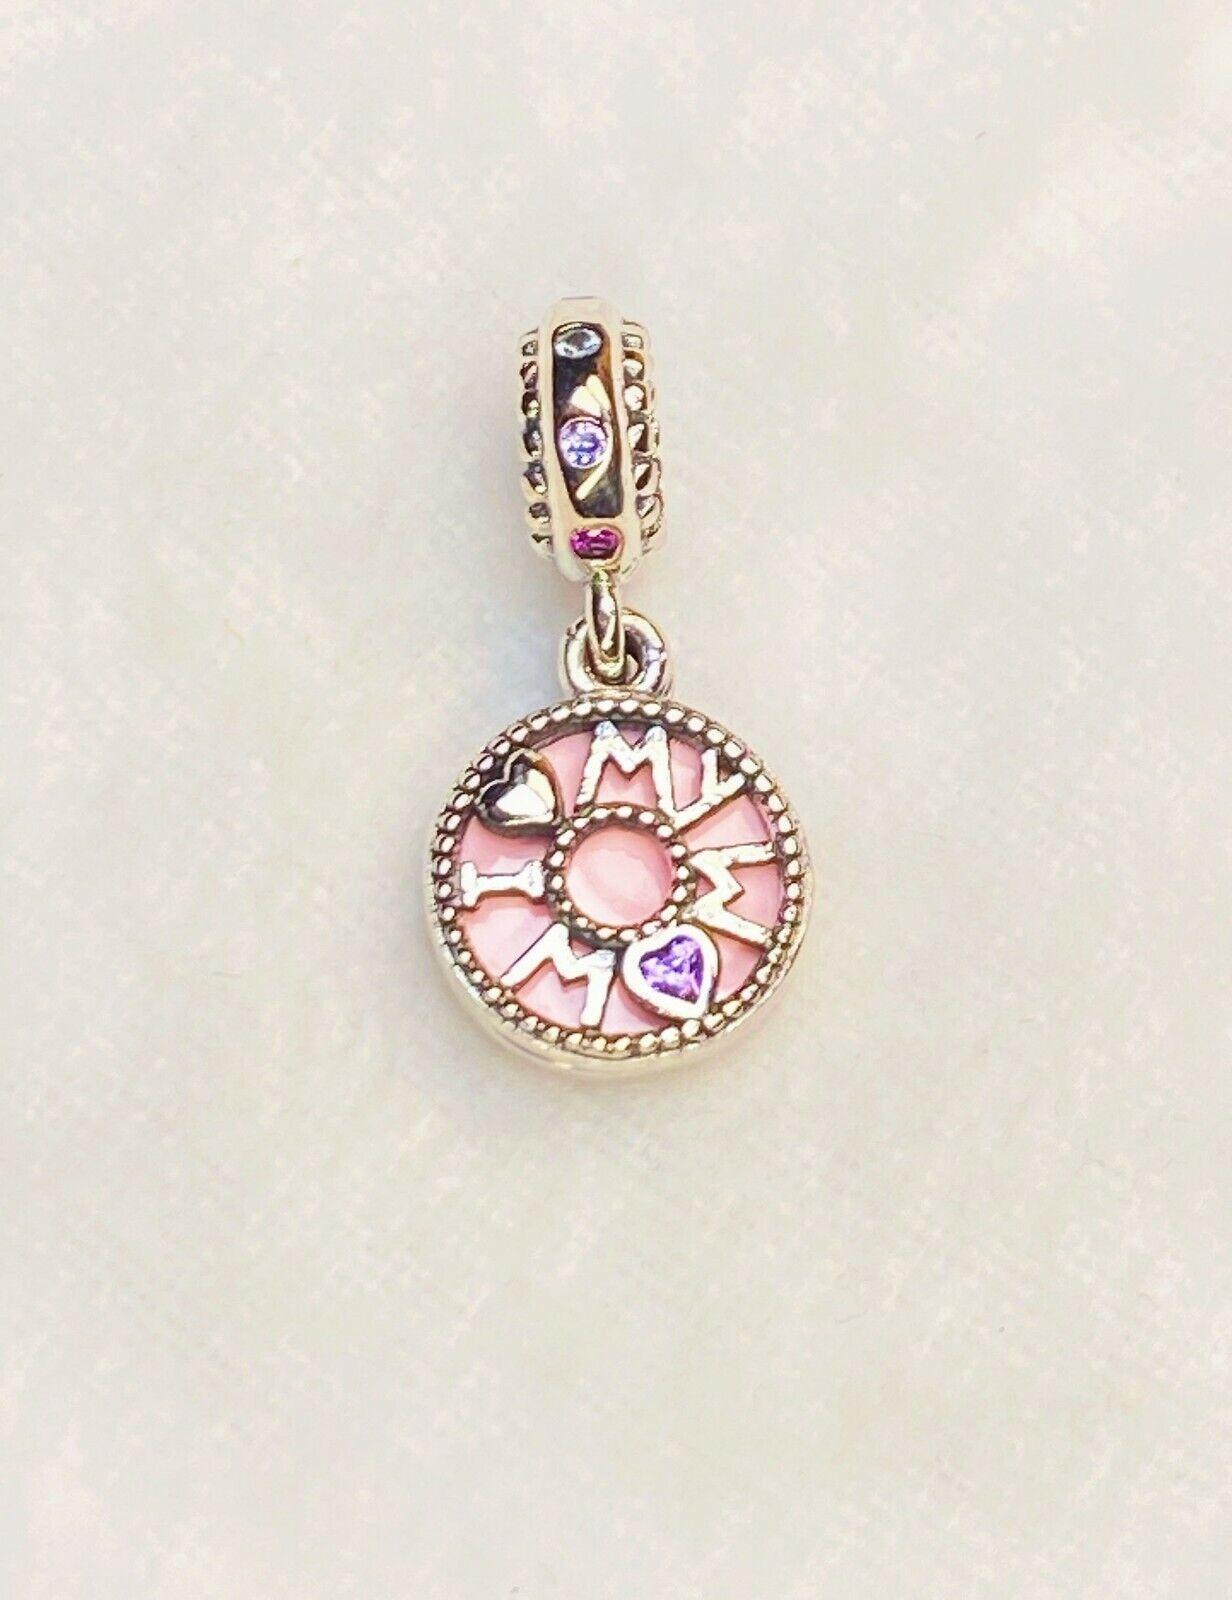 Authentic Pandora Silver 925 ALE Pink I Love My Mum Dangle Charm 797284NRPMX - $15.50